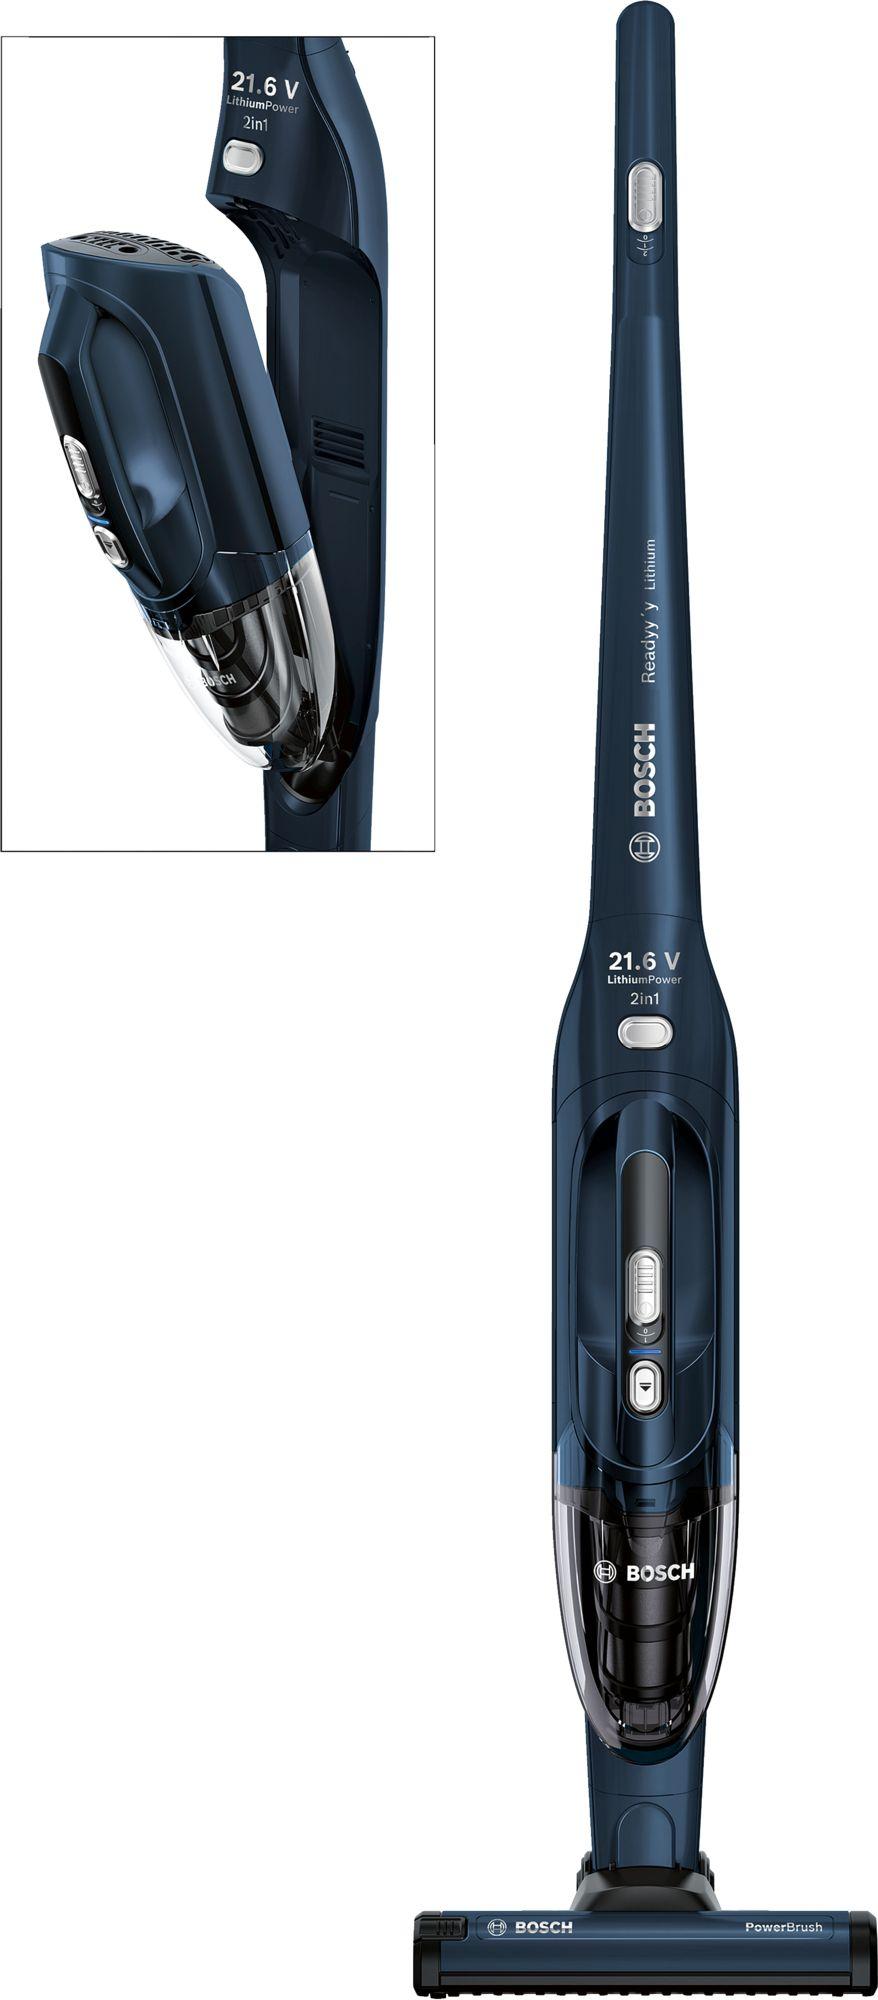 Bosch - Ready 2in1 Cordless Vacuum 21.6V - Blue